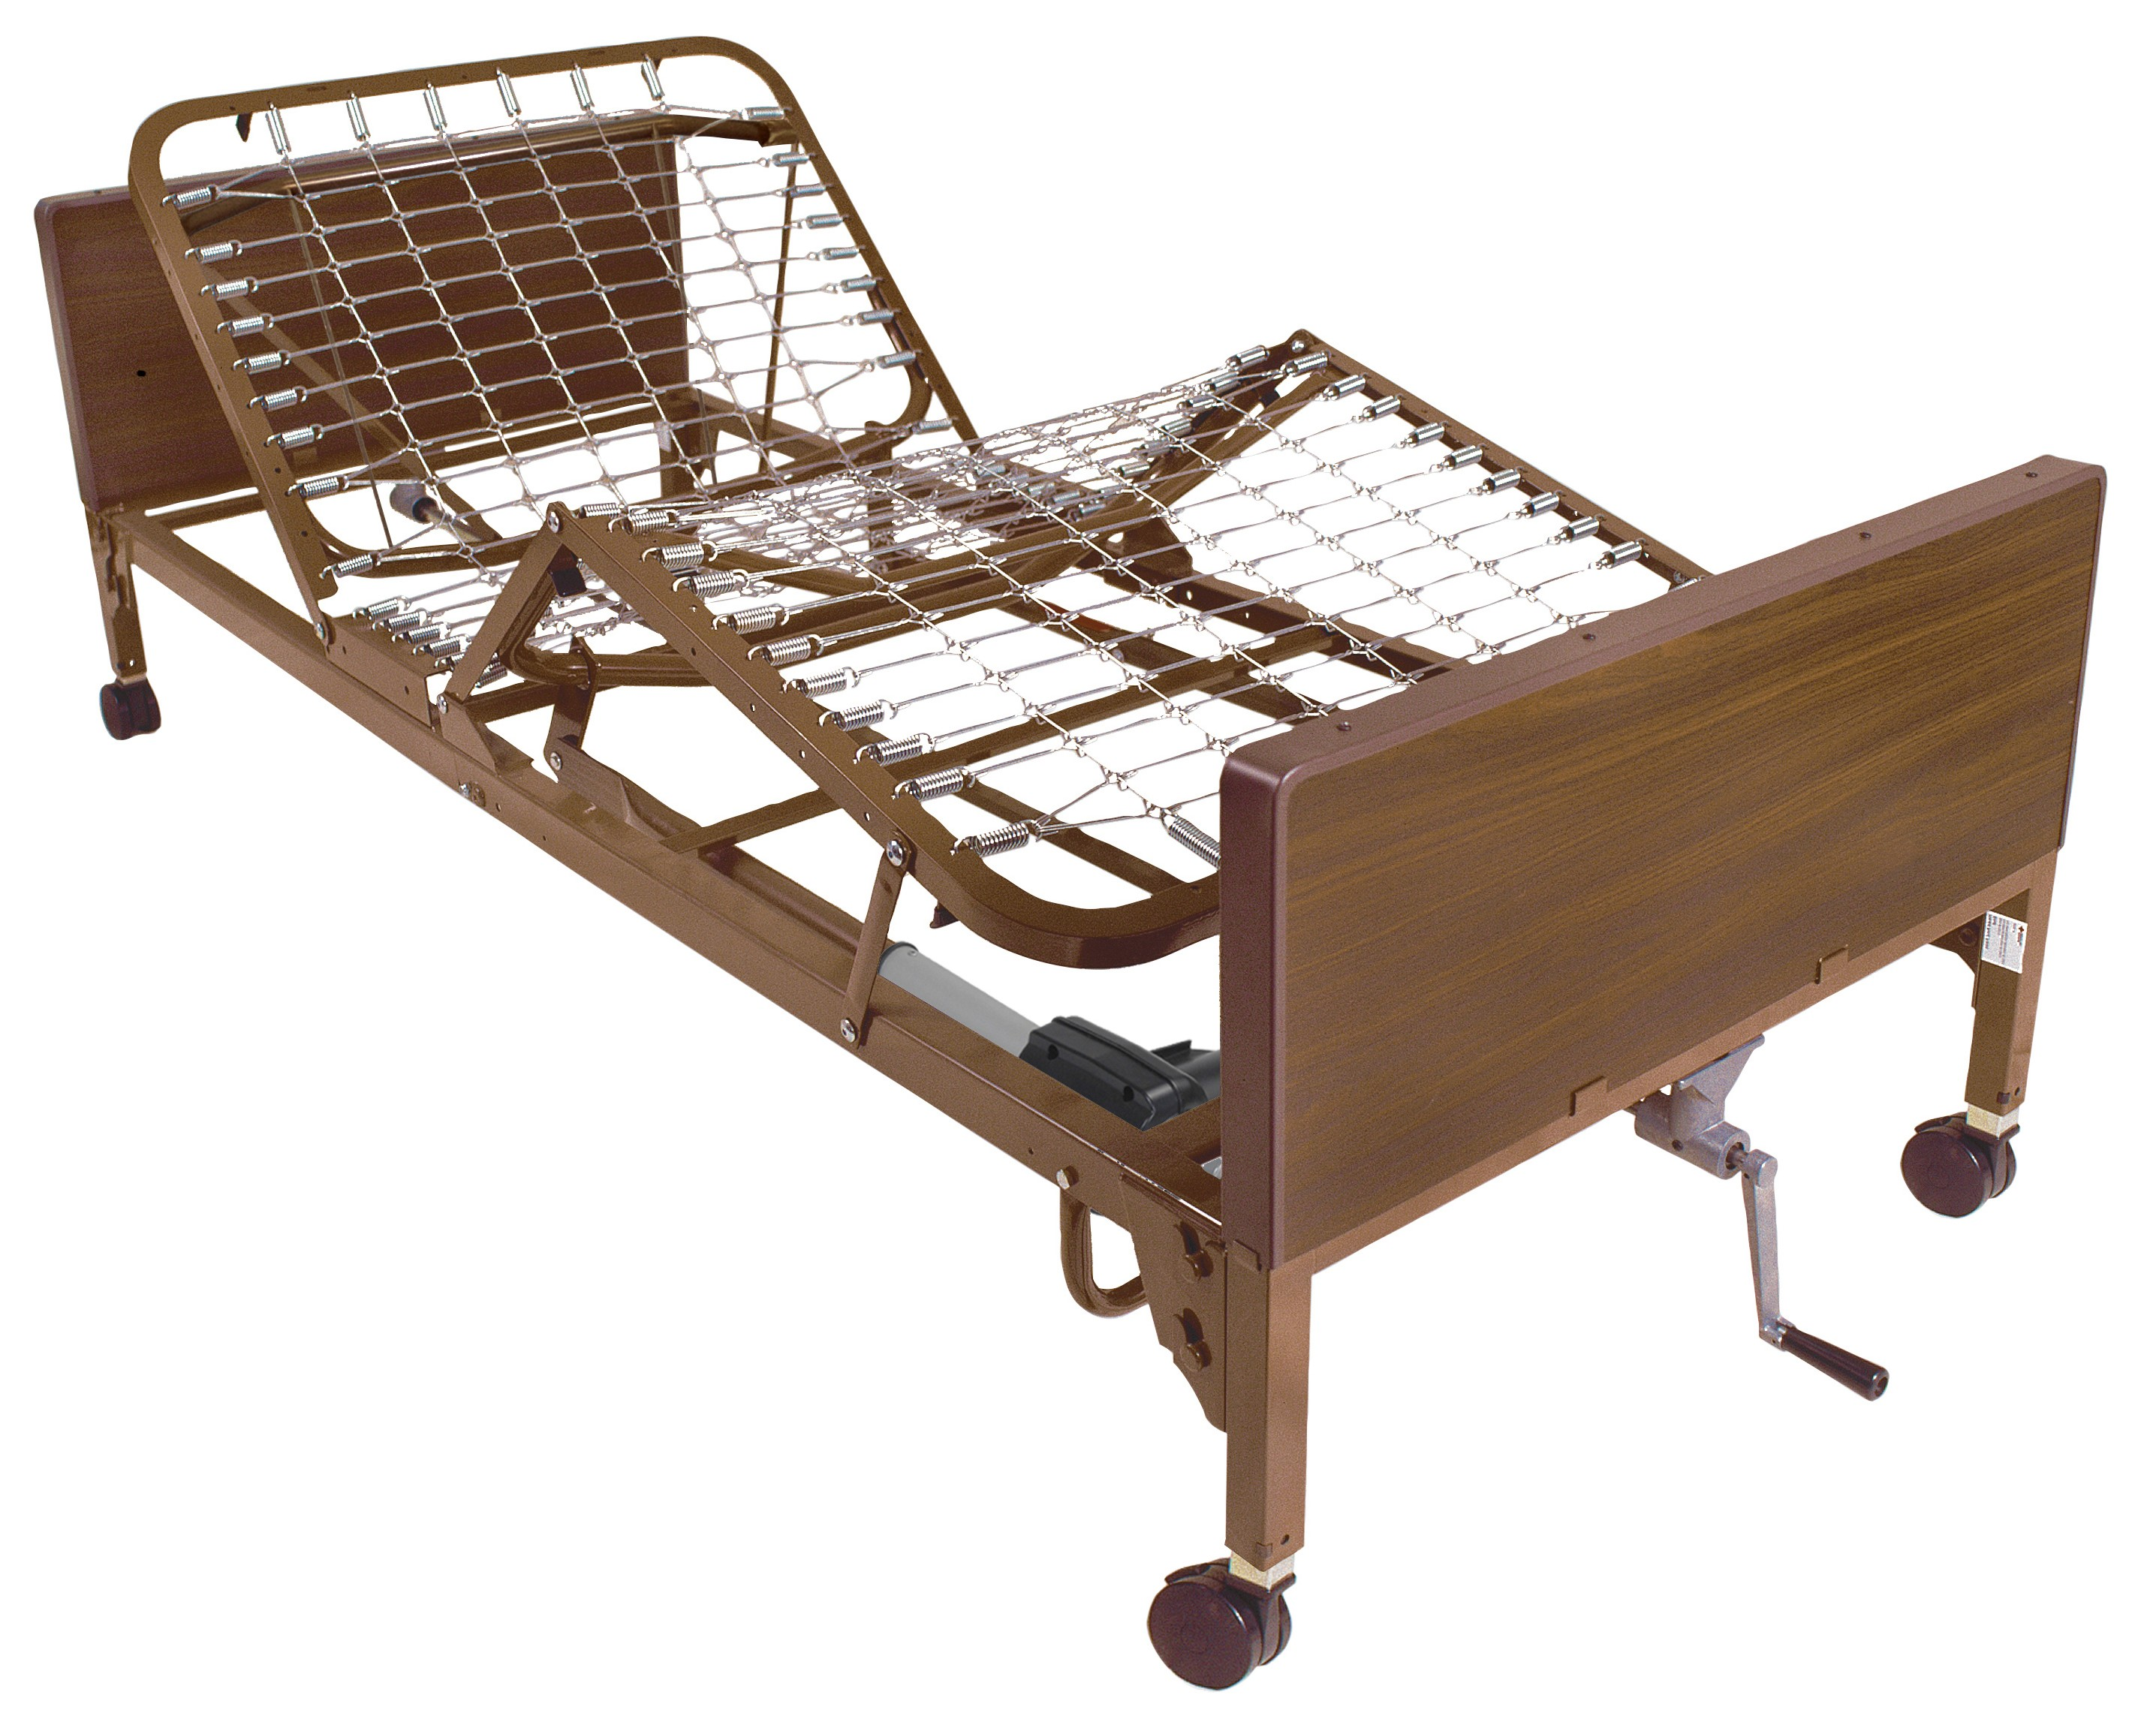 Marietta Hospital Bed Rentals-Hospital Bed Rentals in Marietta